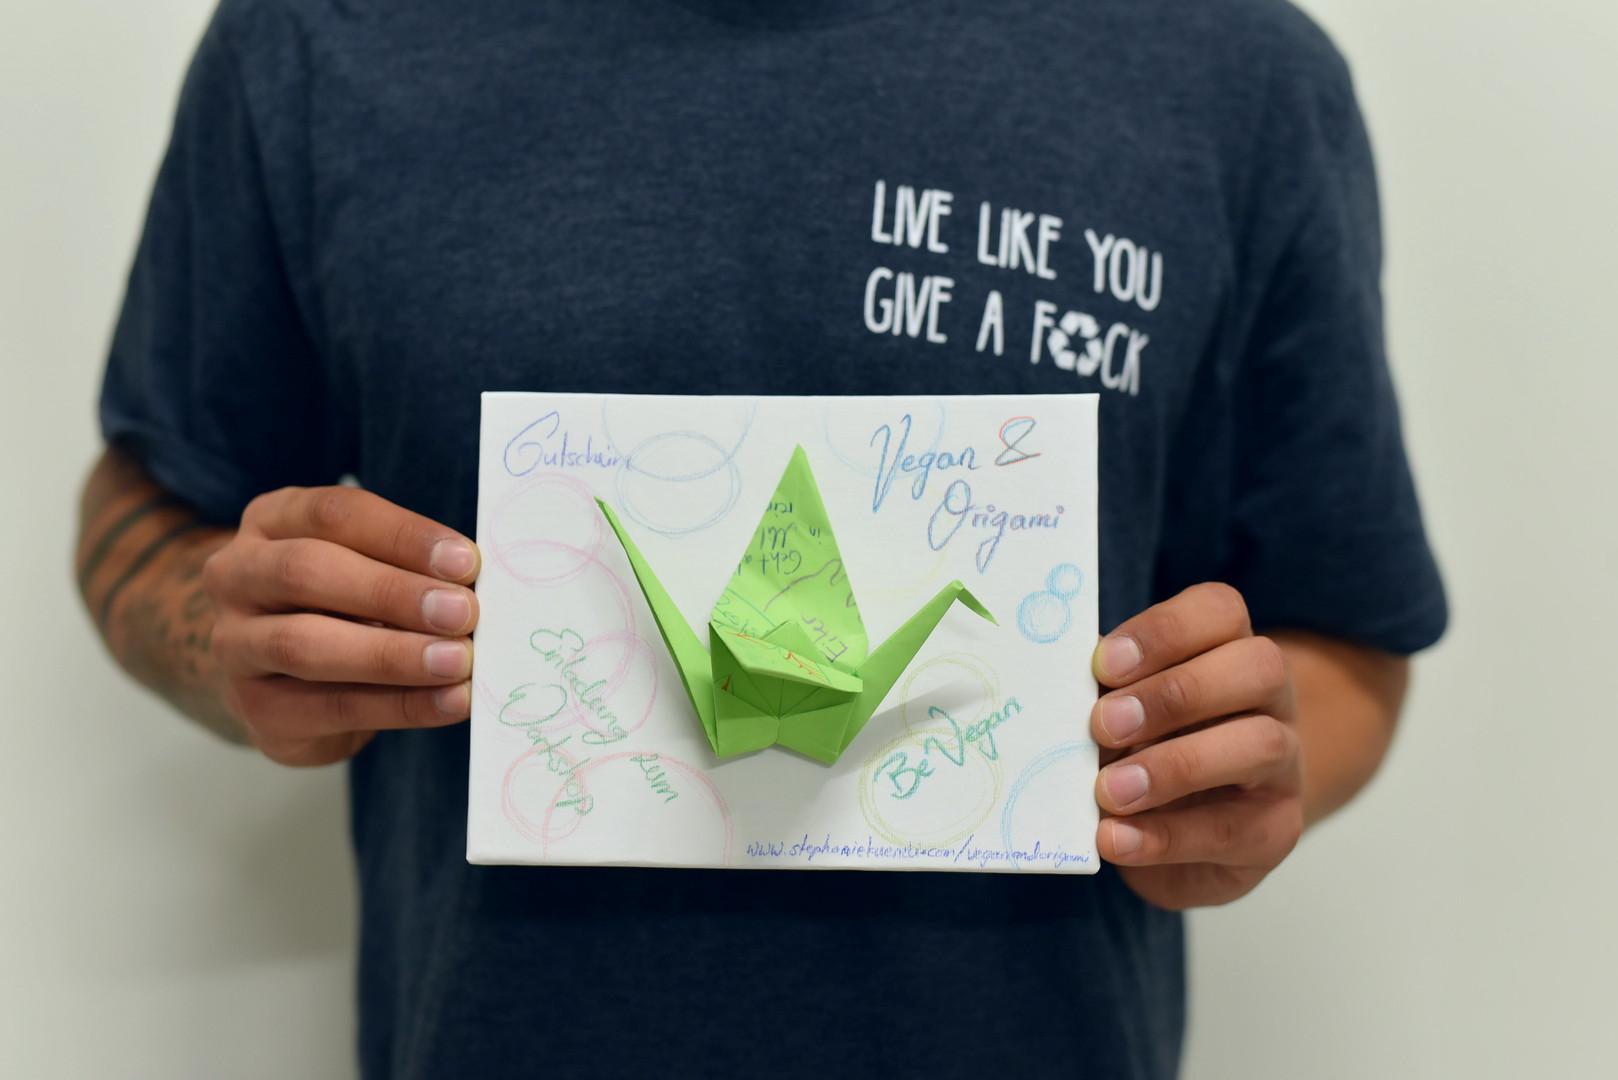 Vegan & Origami Workshop